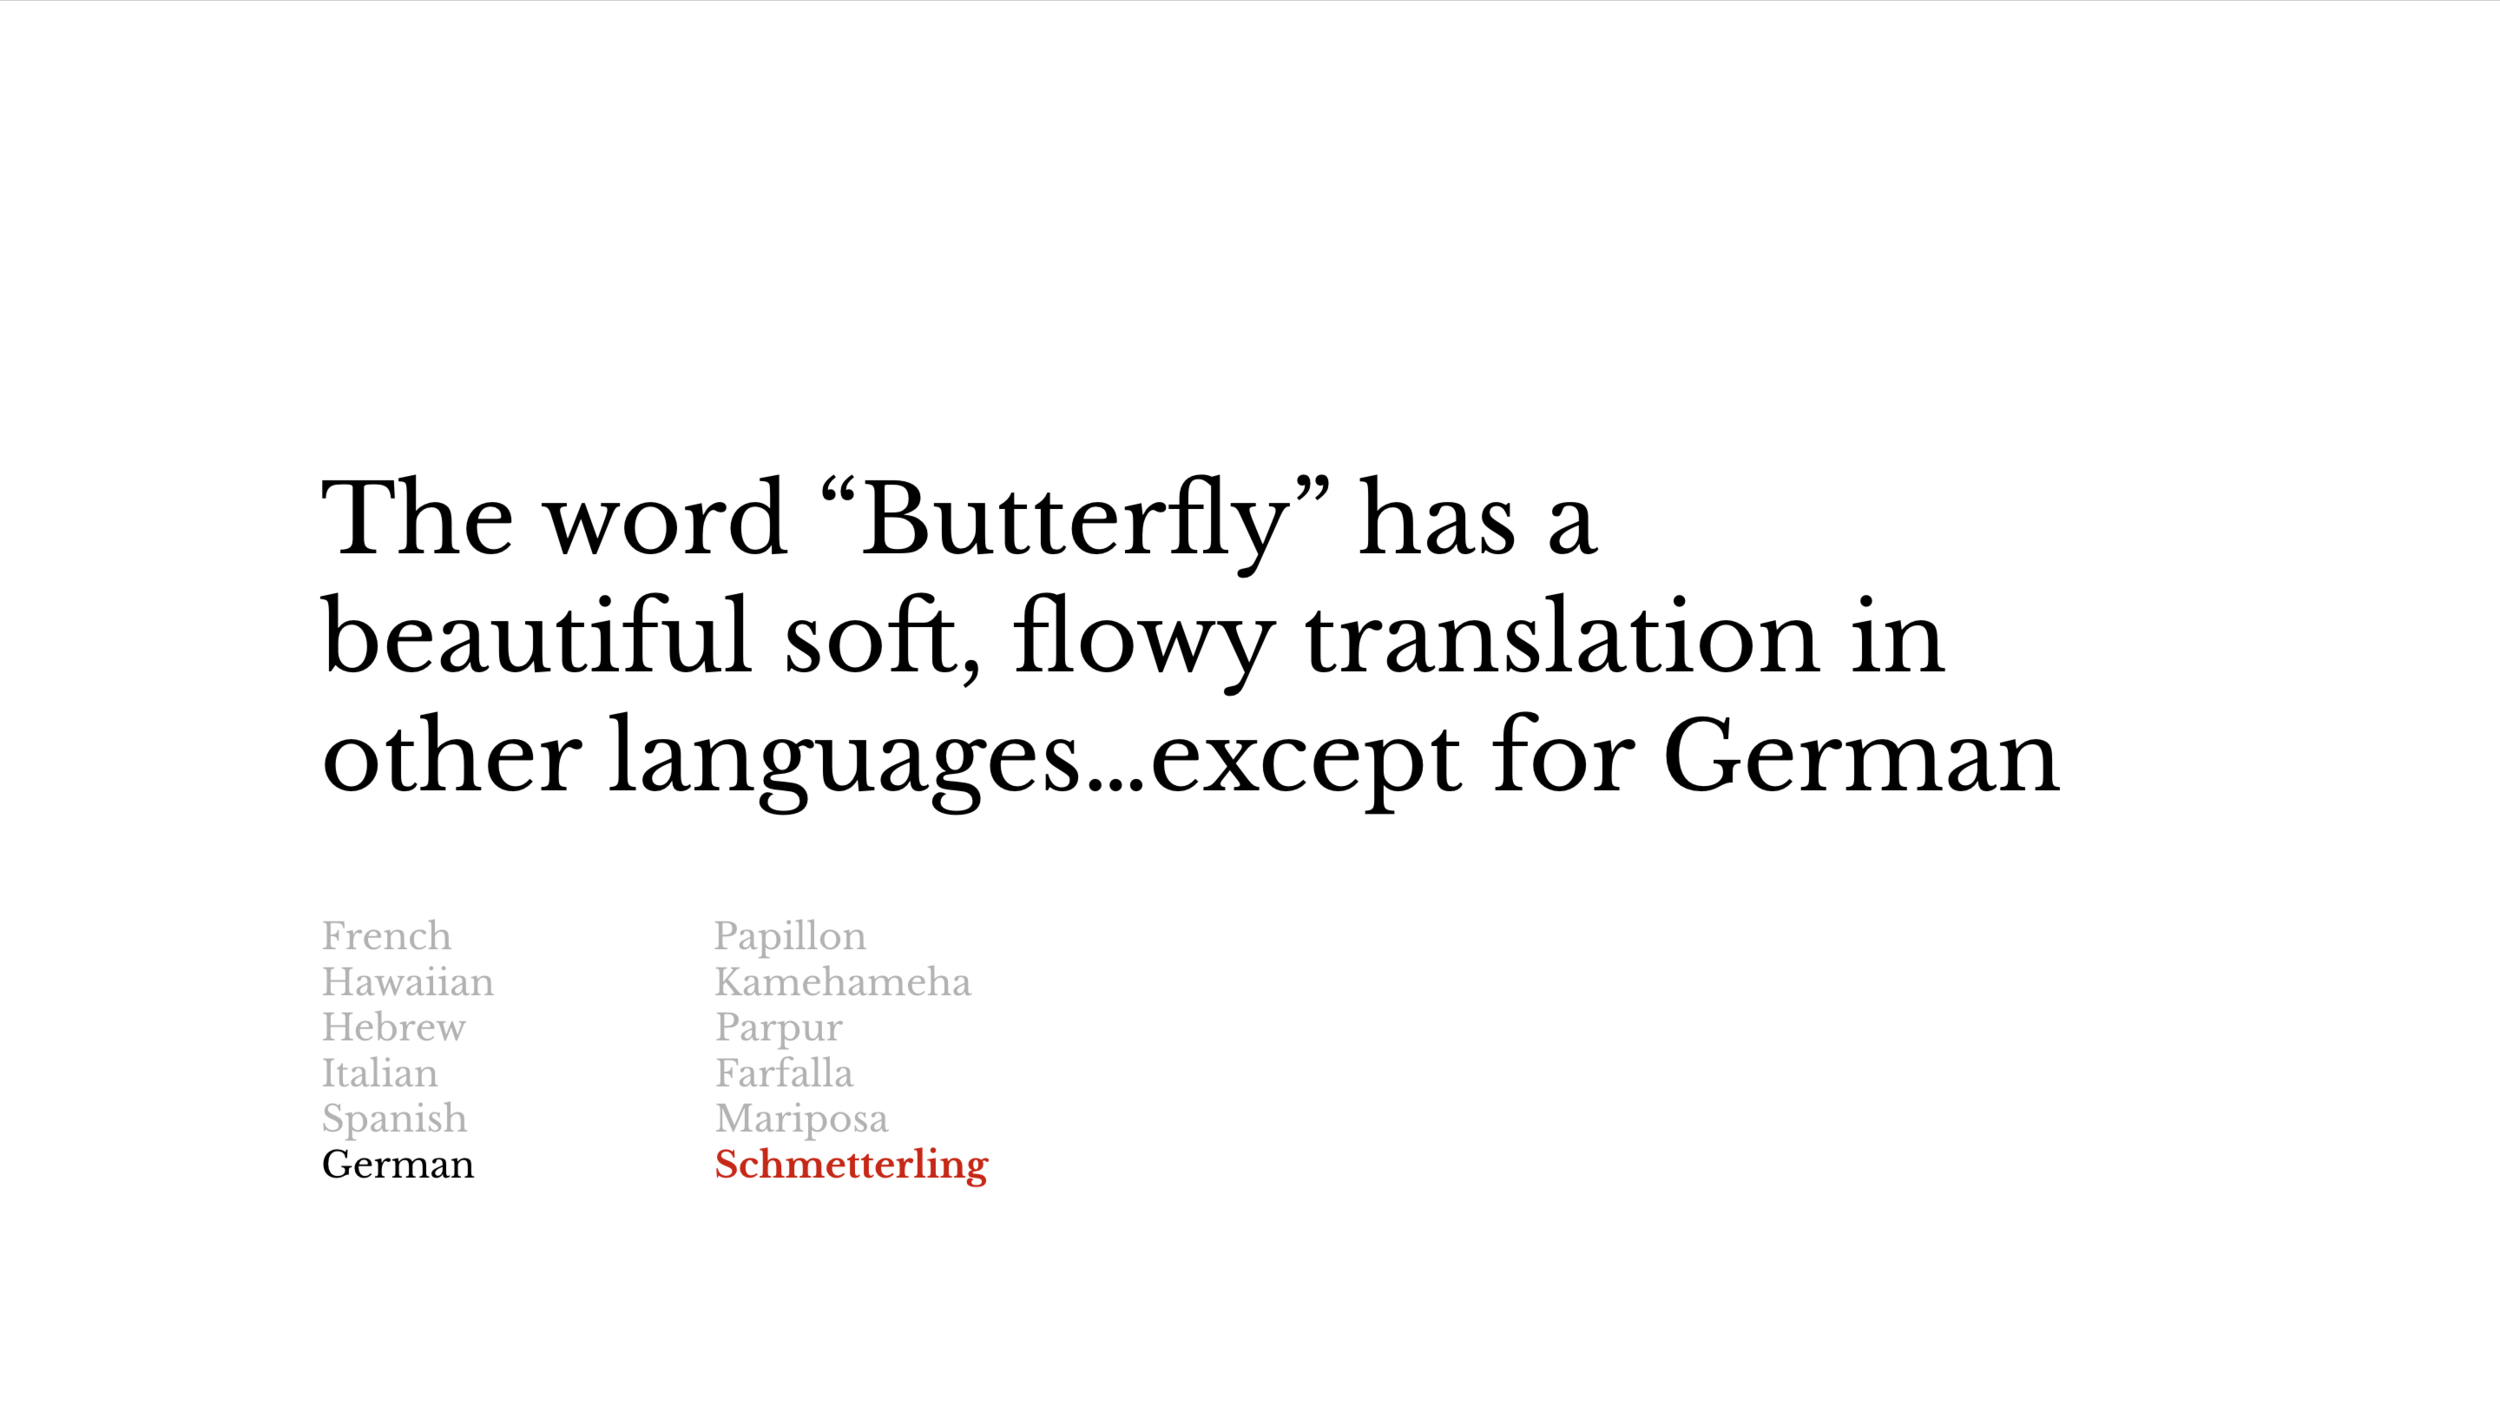 Schmetterling_process2.png